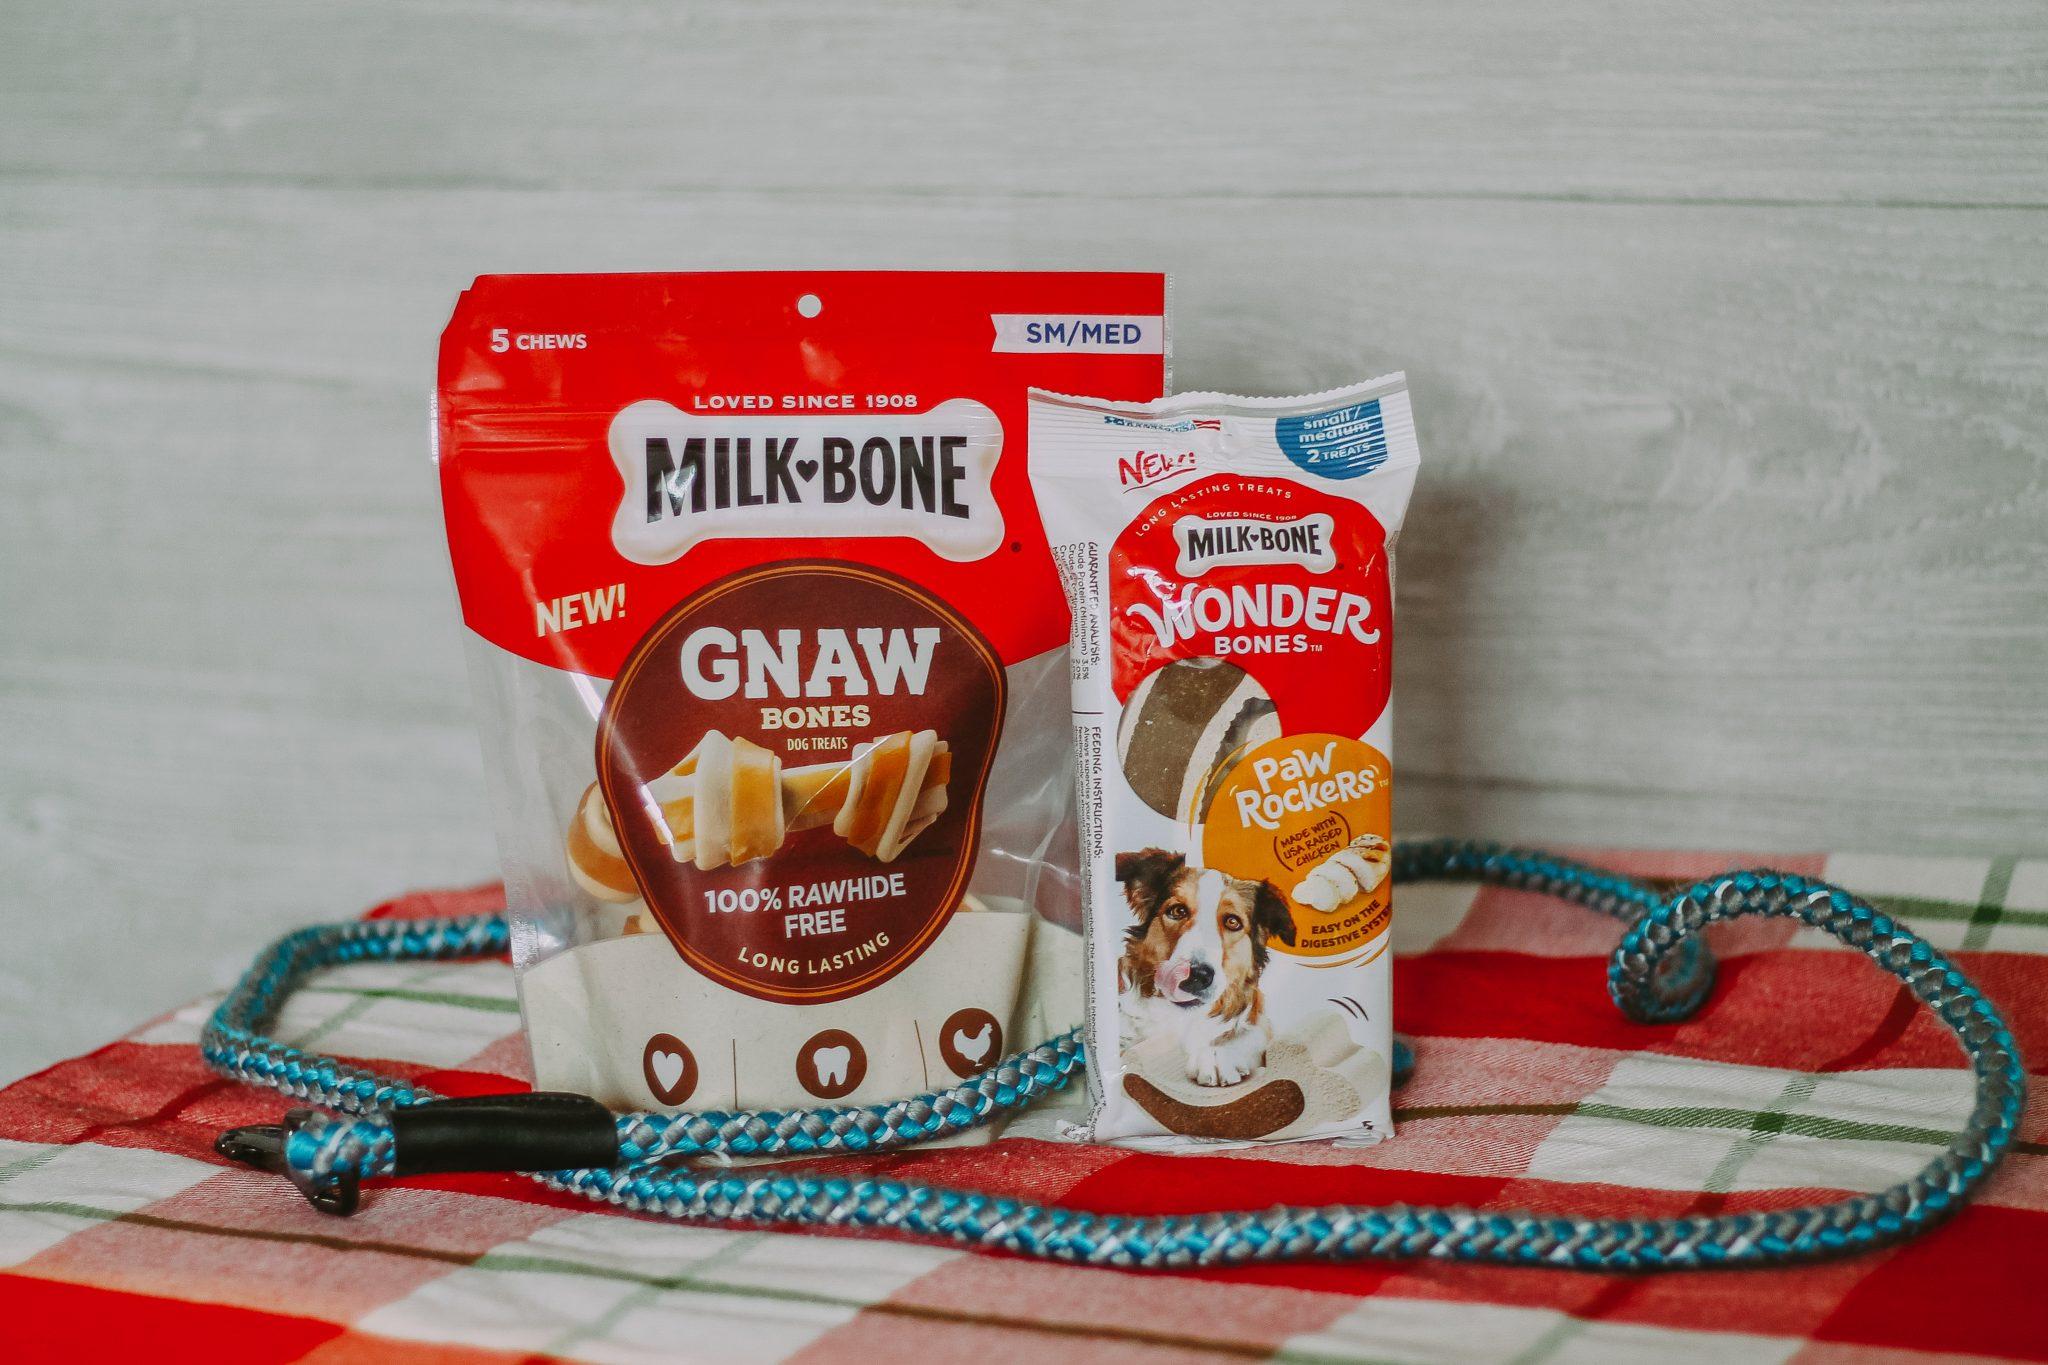 Milk-Bone® Wonder Bones & Gnaw Bones At Meijer